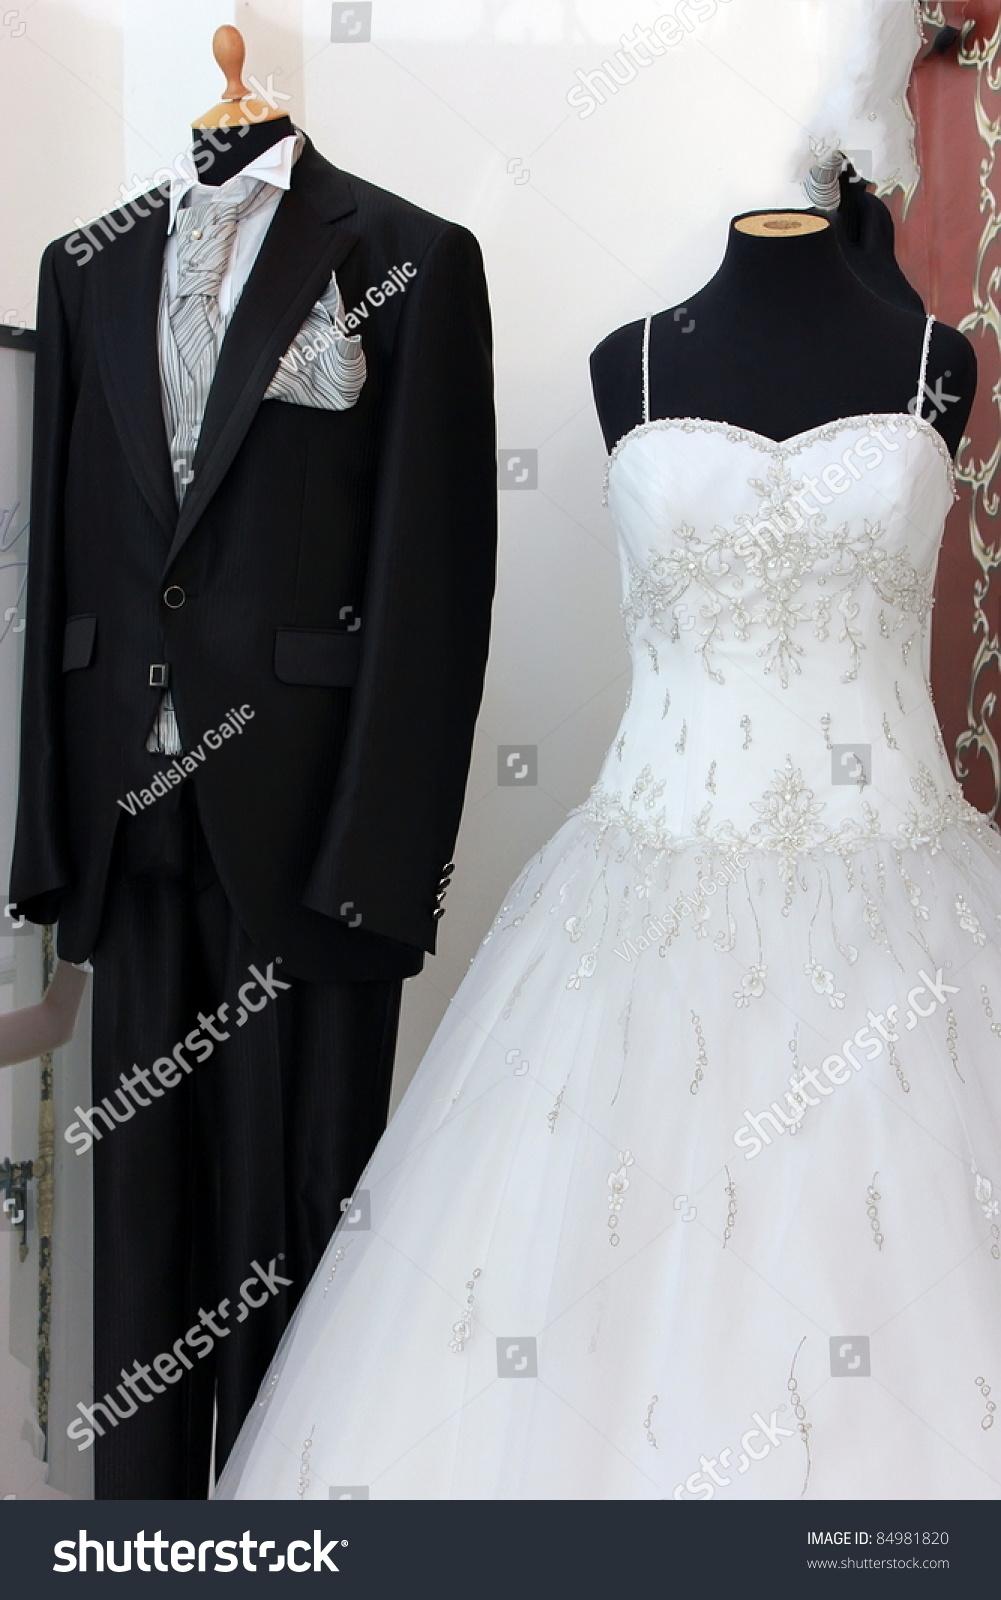 Men Suite White Wedding Dress Stock Photo (Edit Now) 84981820 ...